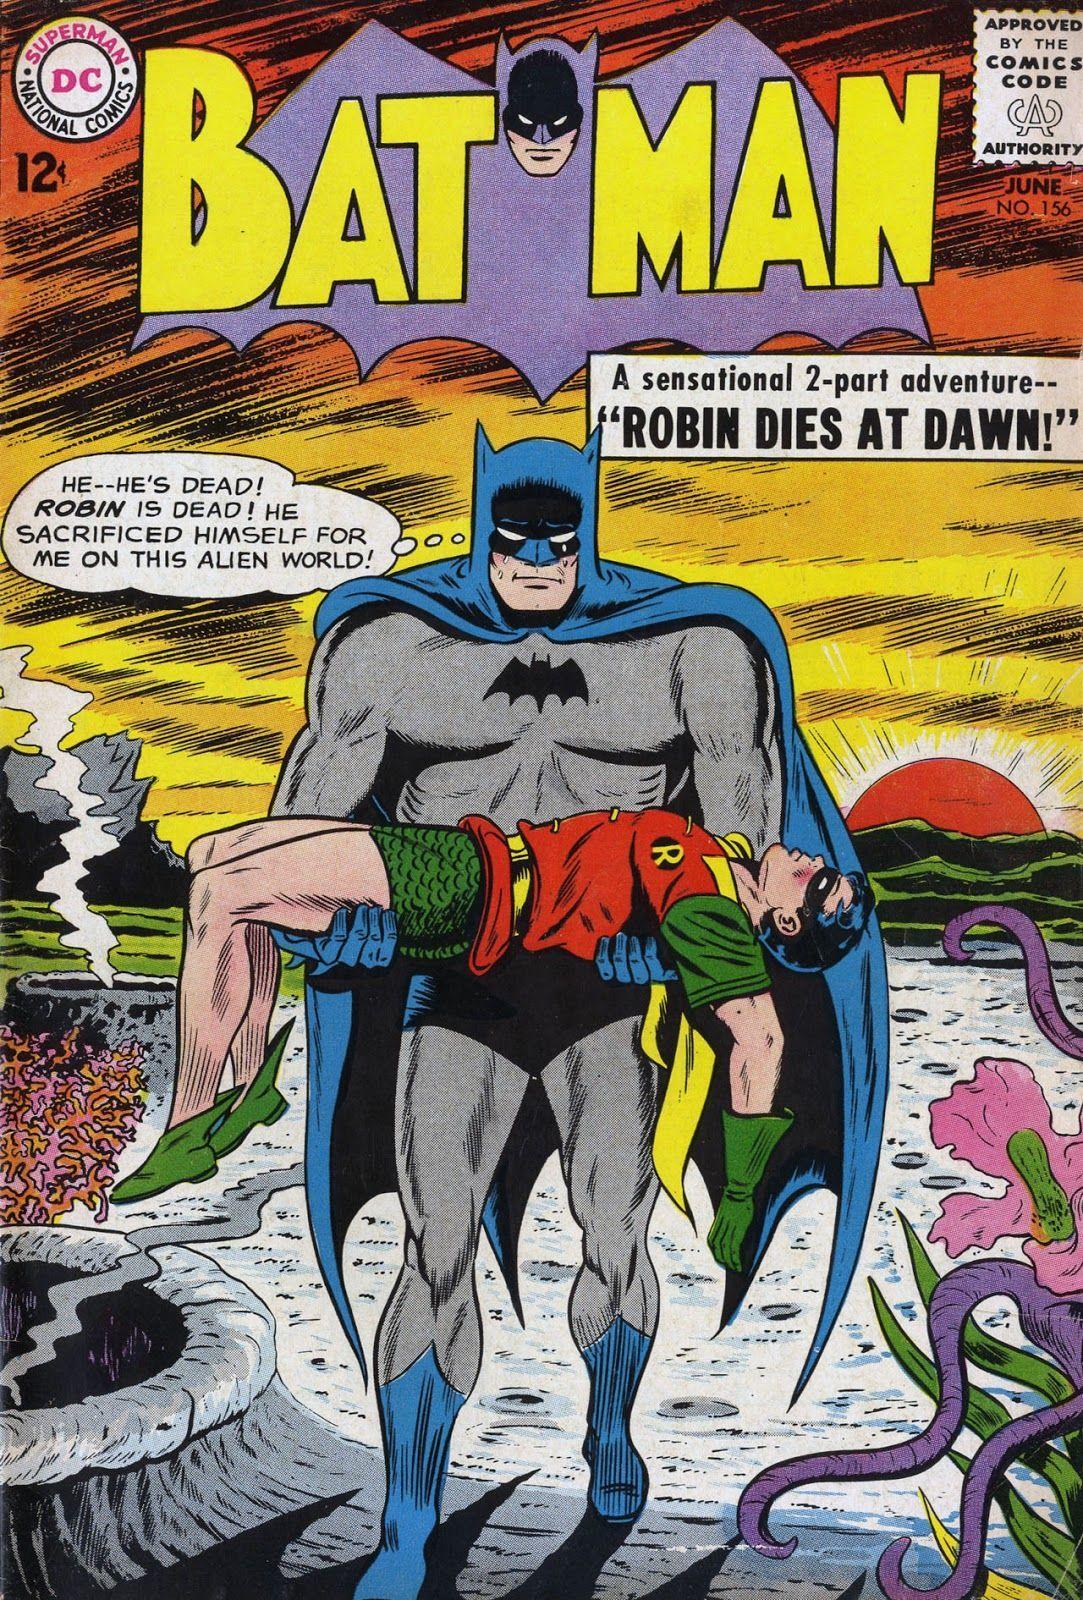 Batman #156 (Writer: Bill Finger, Art: Sheldon Moldoff, Charles Paris)